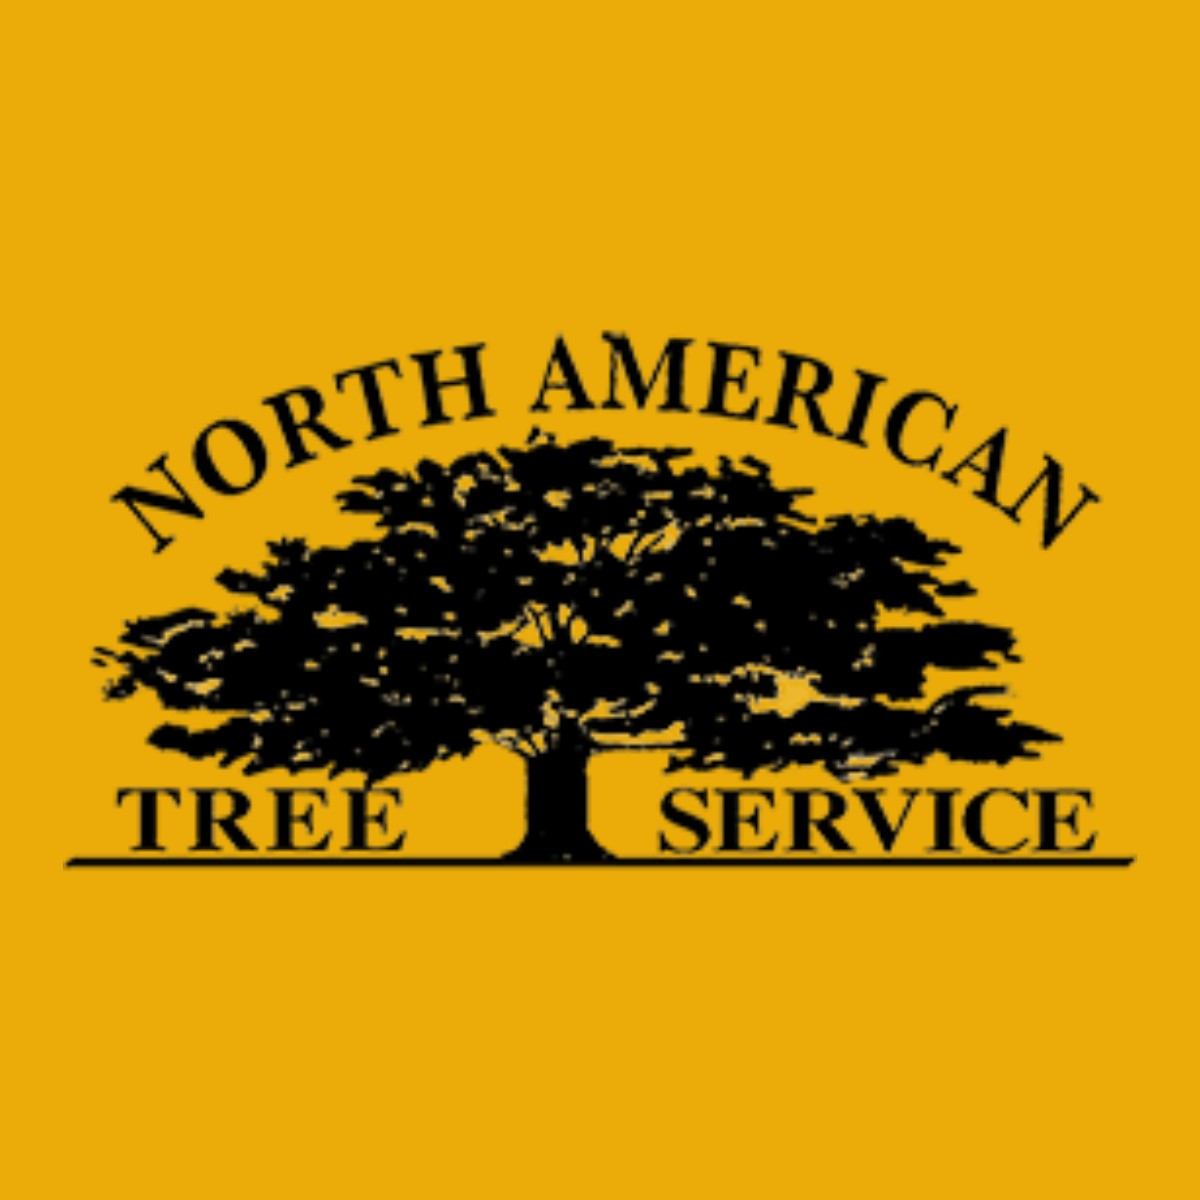 North American Tree Service - Loganville, GA - Lawn Care & Grounds Maintenance